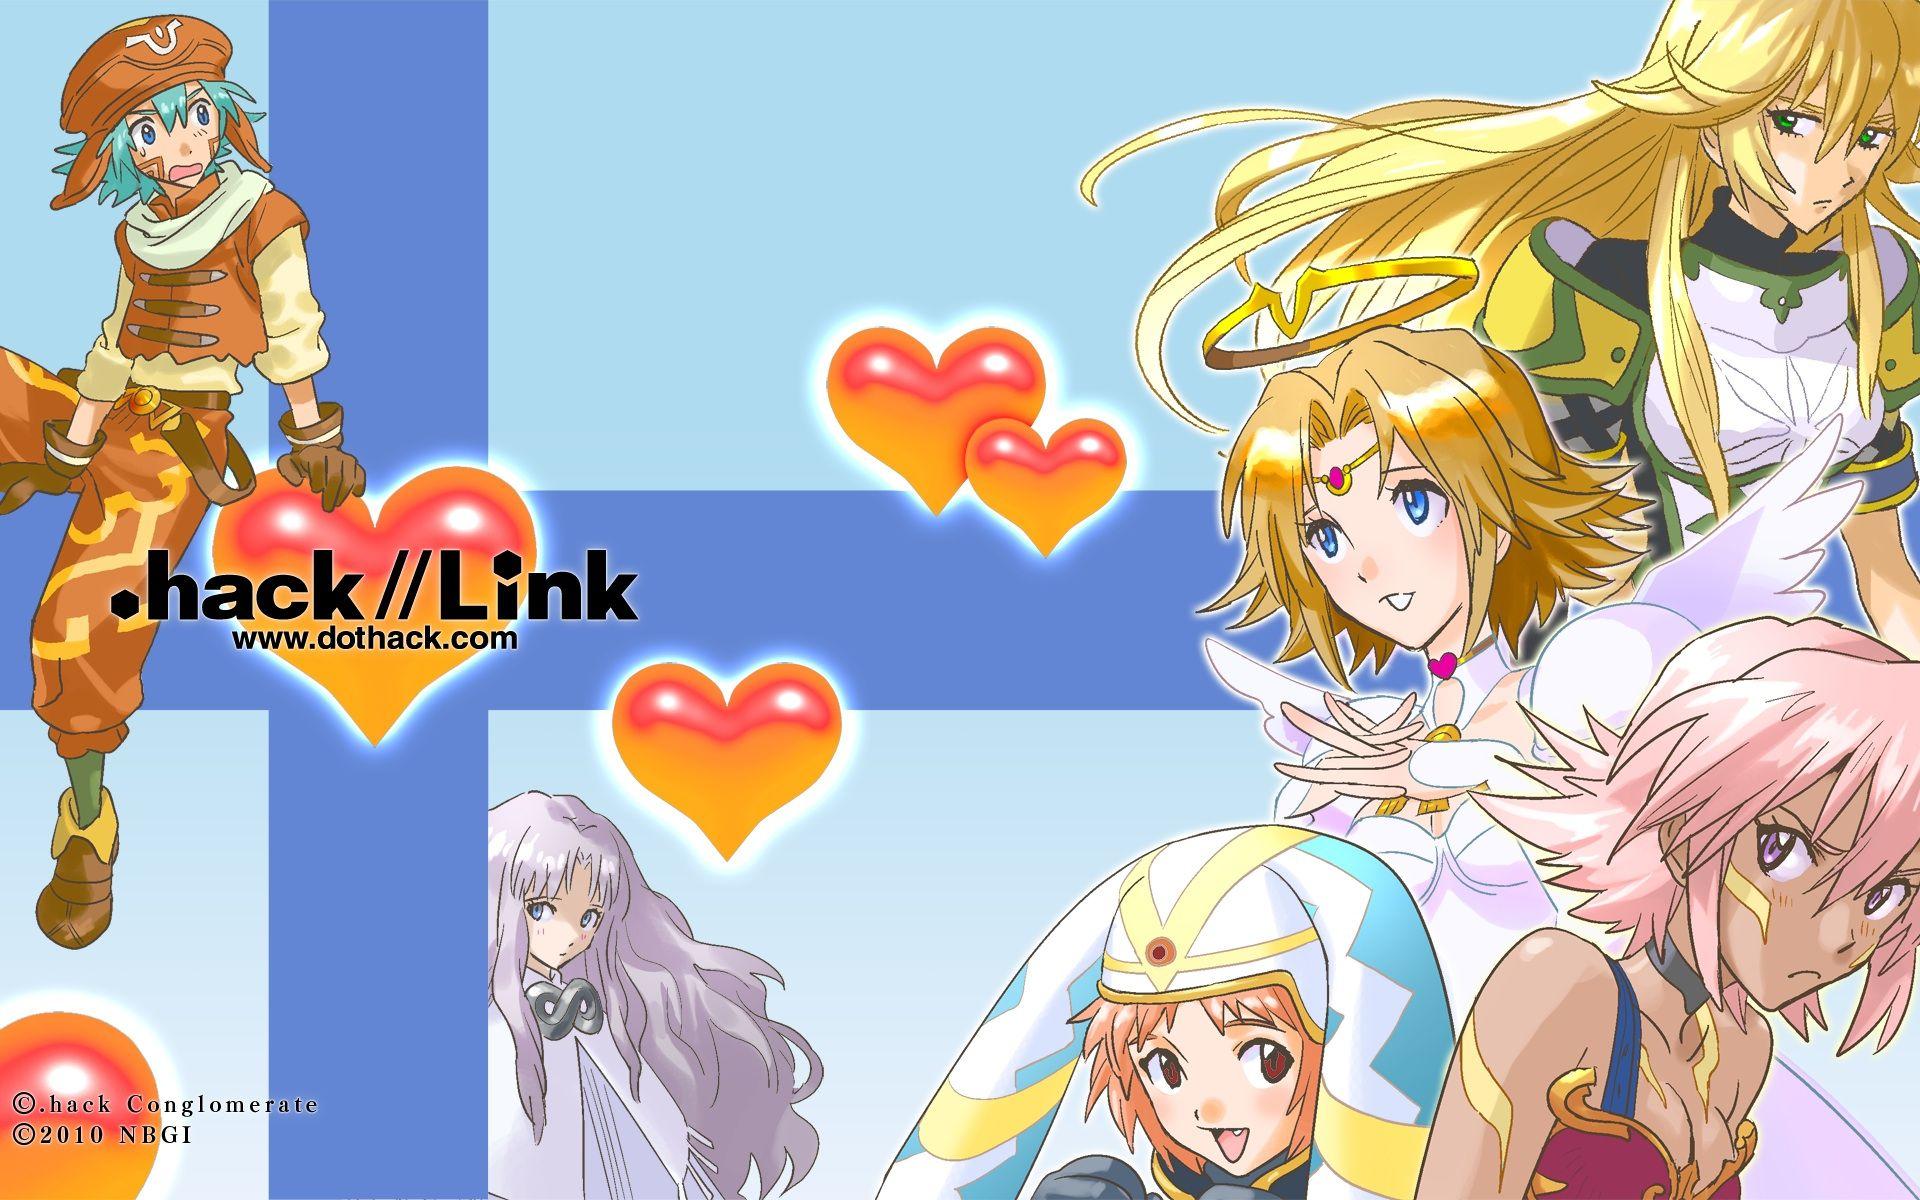 Konachan.com - 71247 .hack__ .hack__link